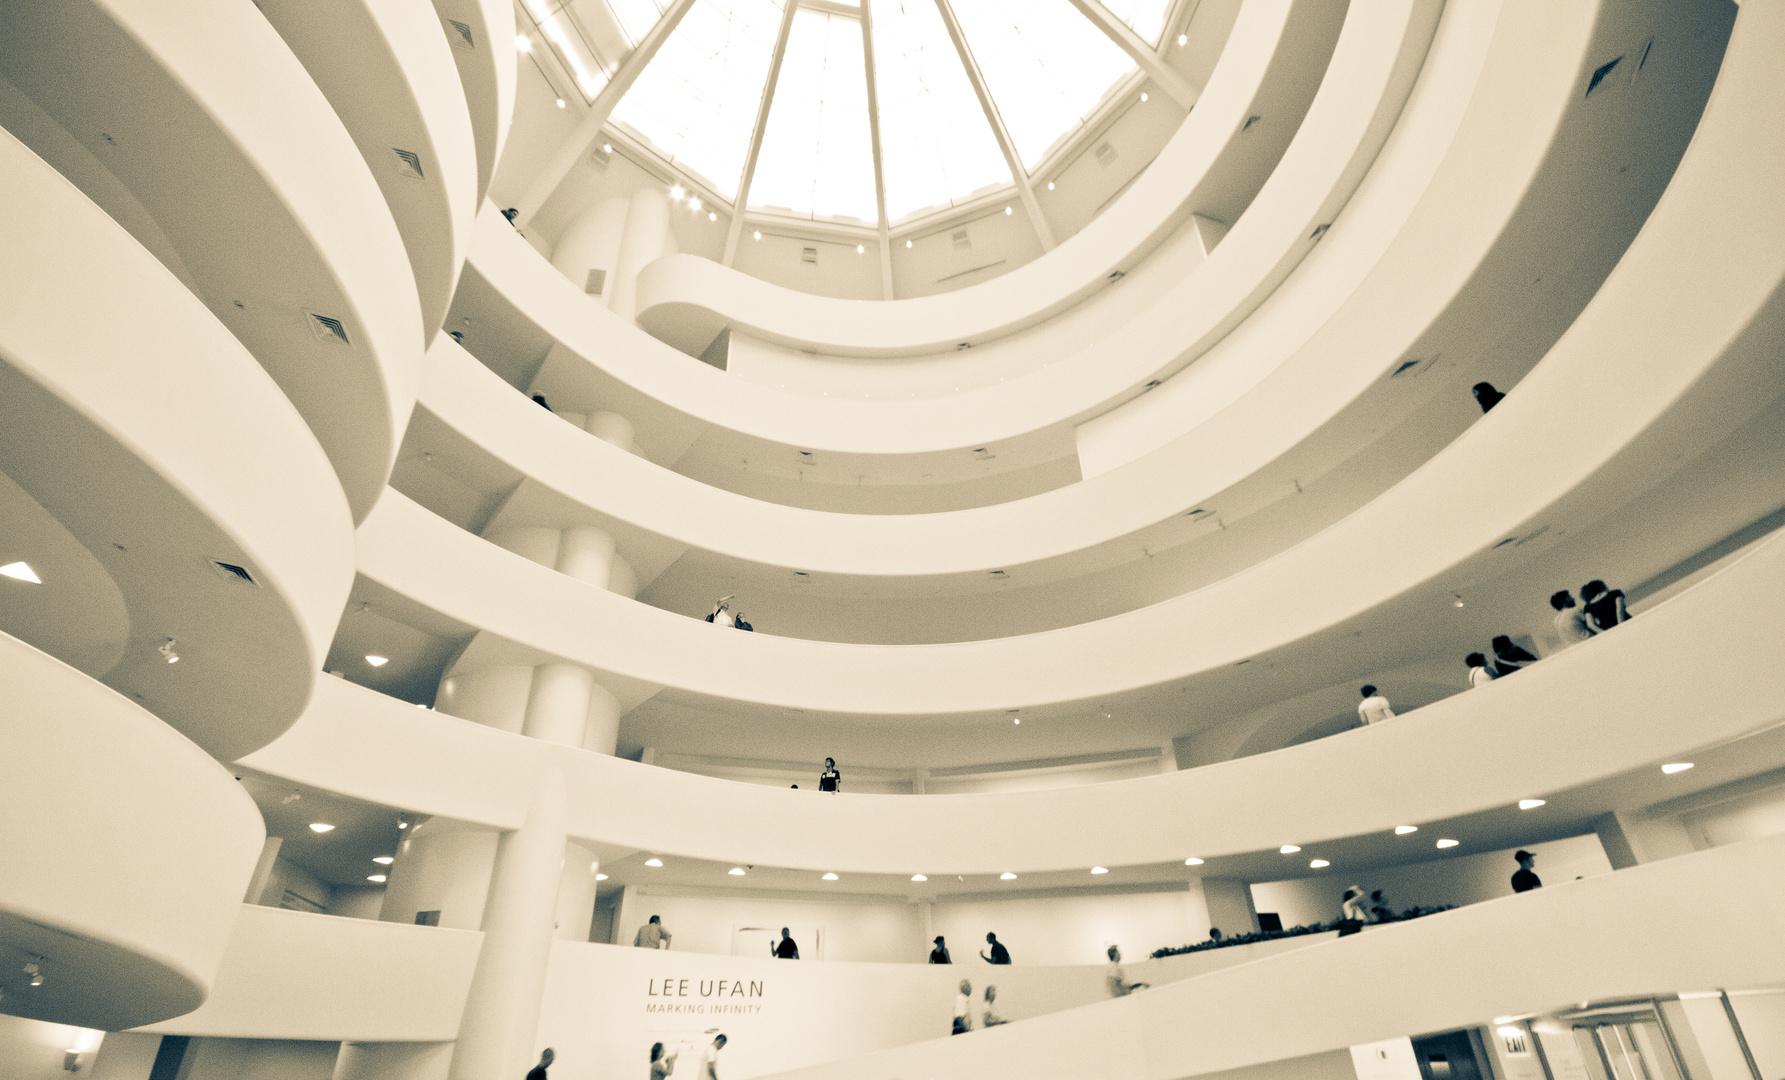 inside Guggenheim Museum Foto & Bild | north america ...  Guggenheim Inside